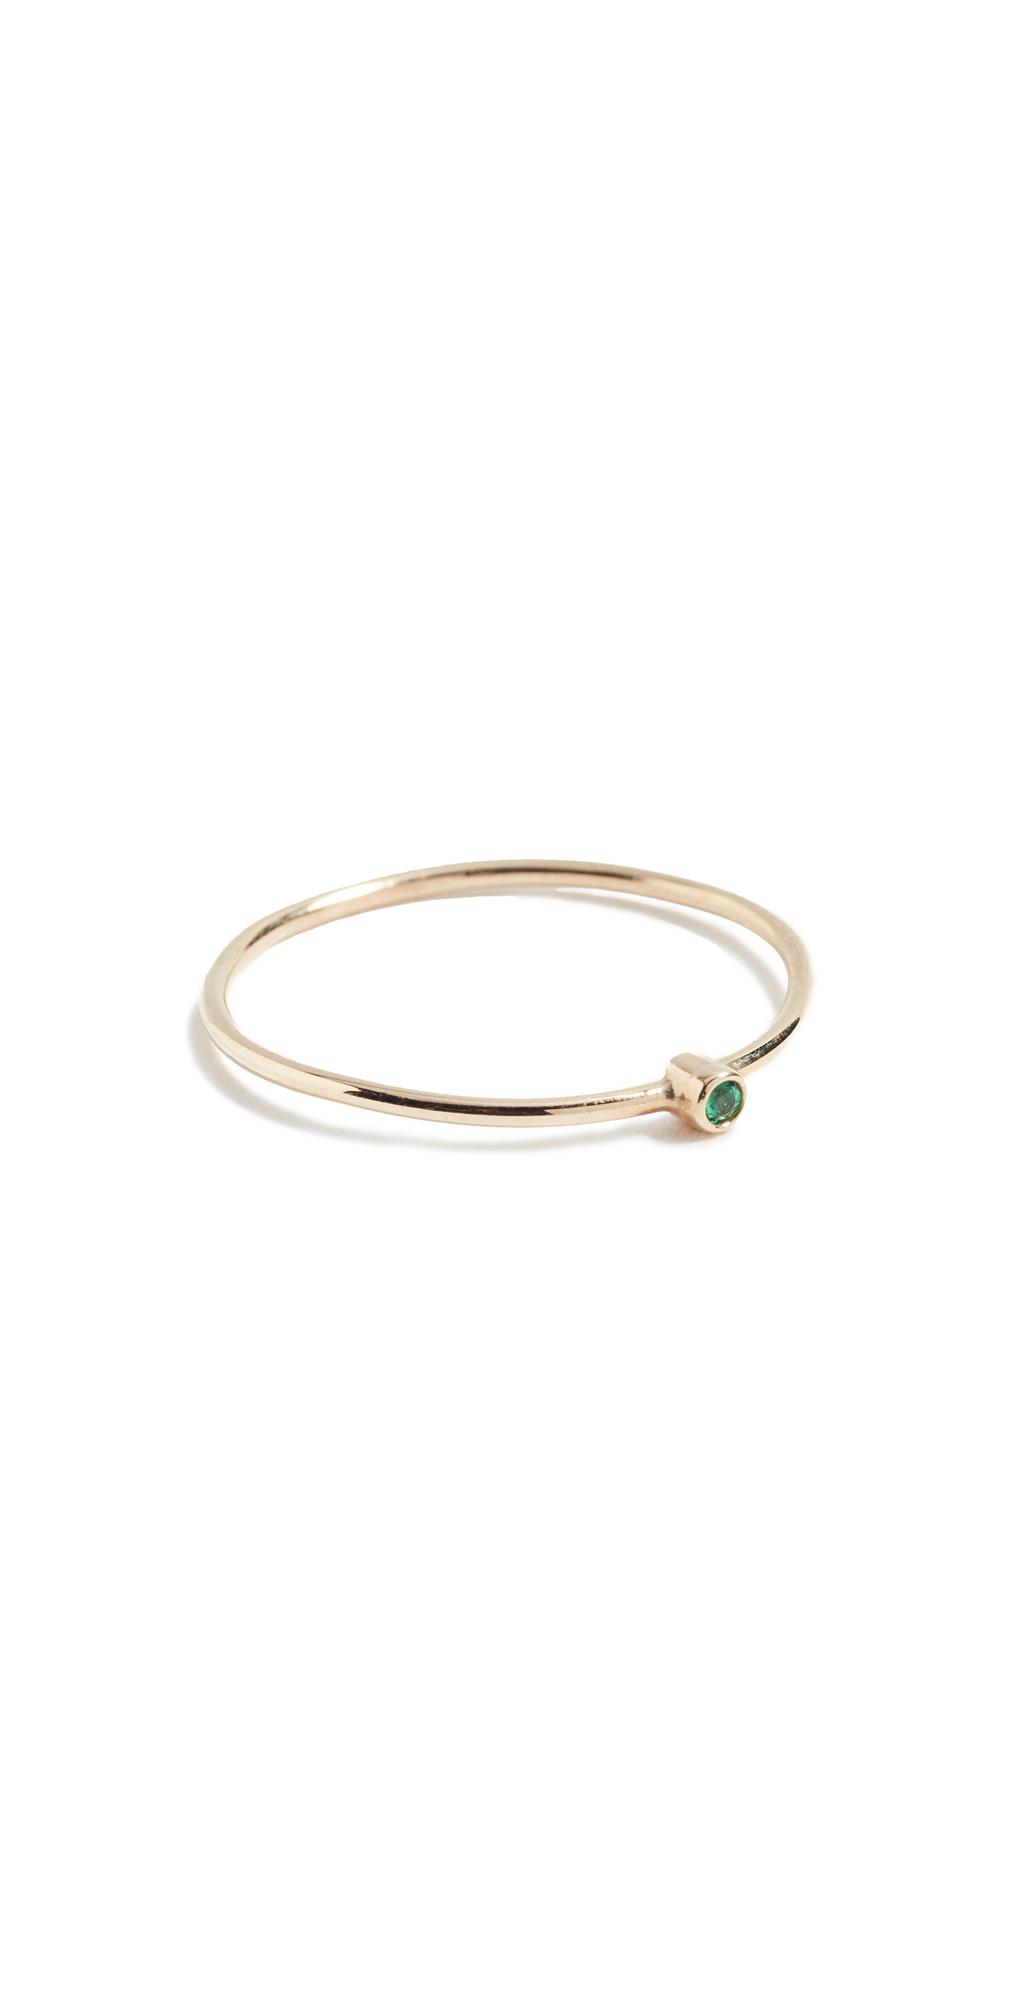 18k Gold Thin Emerald Ring